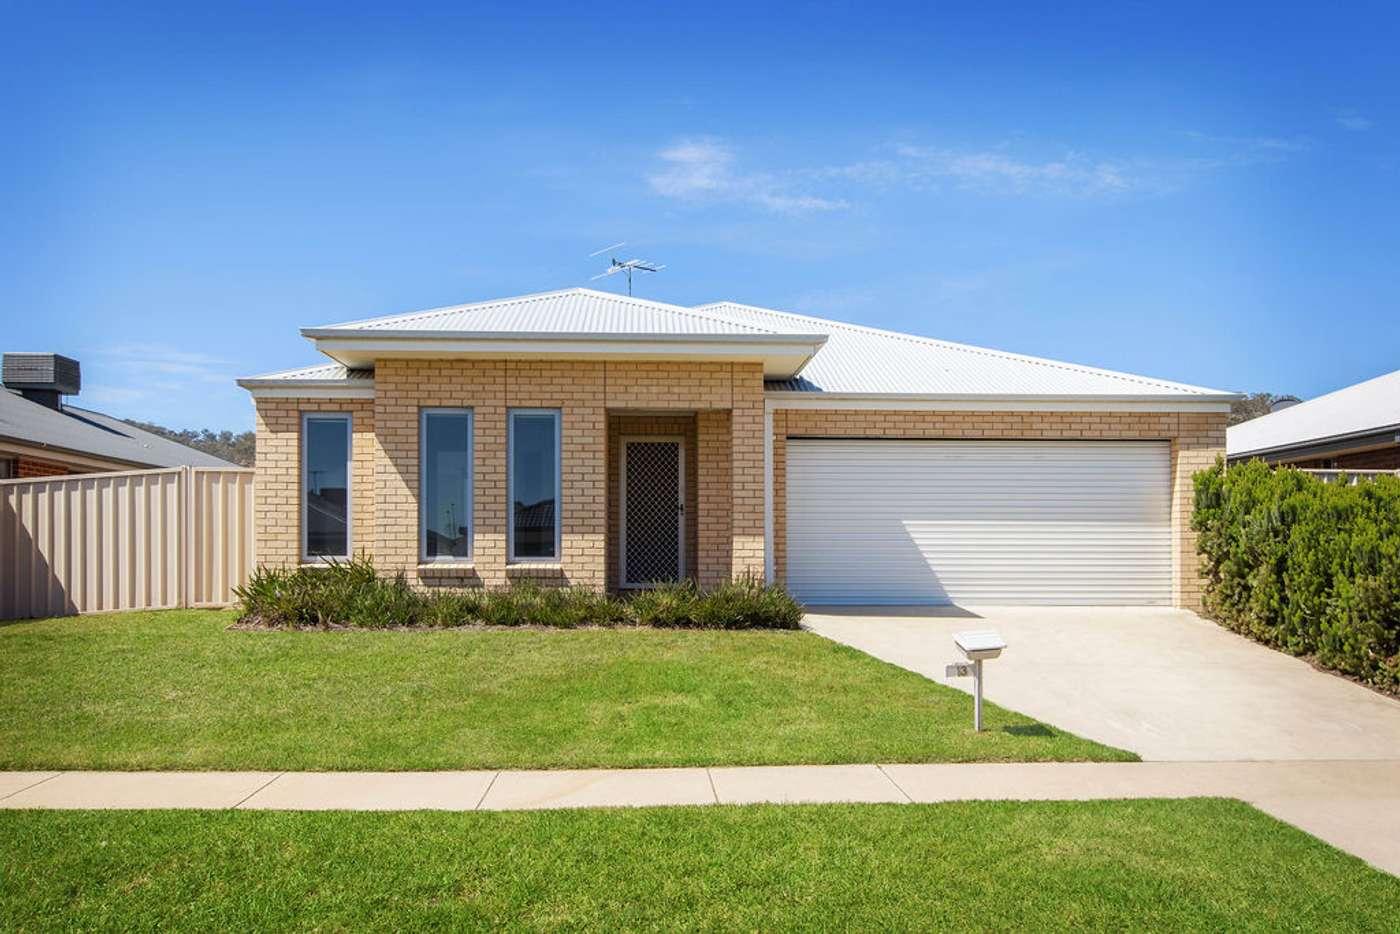 Main view of Homely house listing, 13 Mackey Street, Wodonga VIC 3690